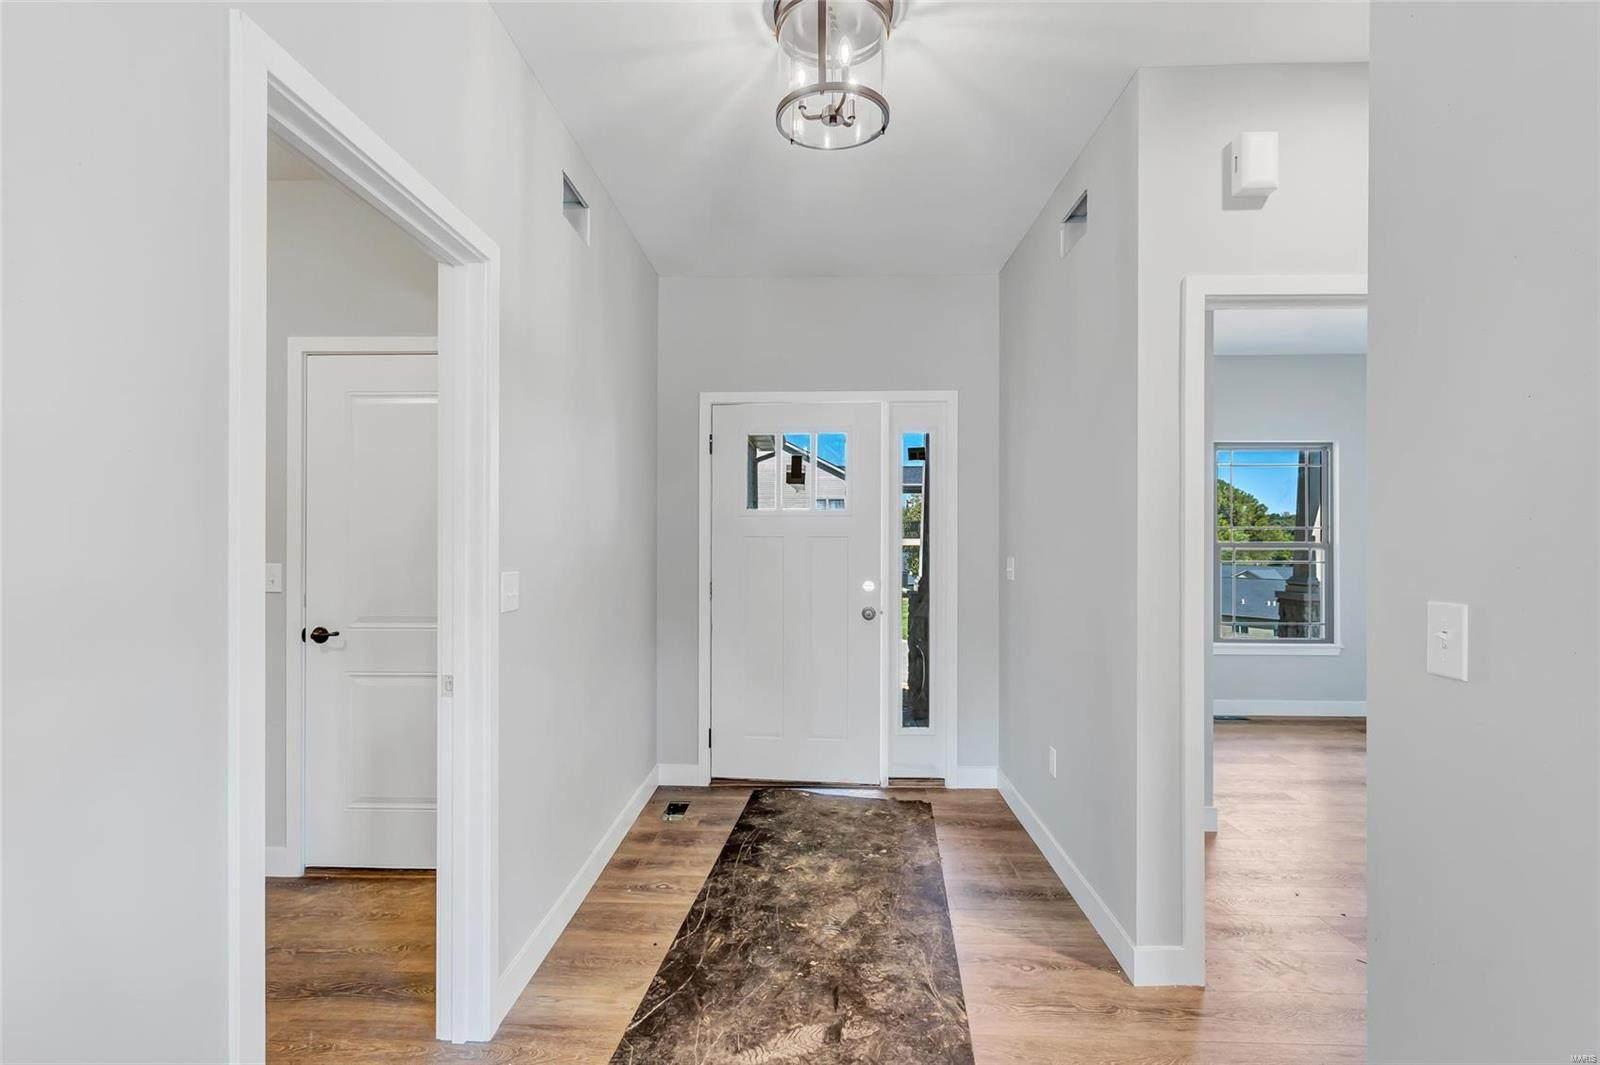 8078 Villa Valley Lane, Caseyville, IL 62232 (#21043358) :: Tarrant & Harman Real Estate and Auction Co.